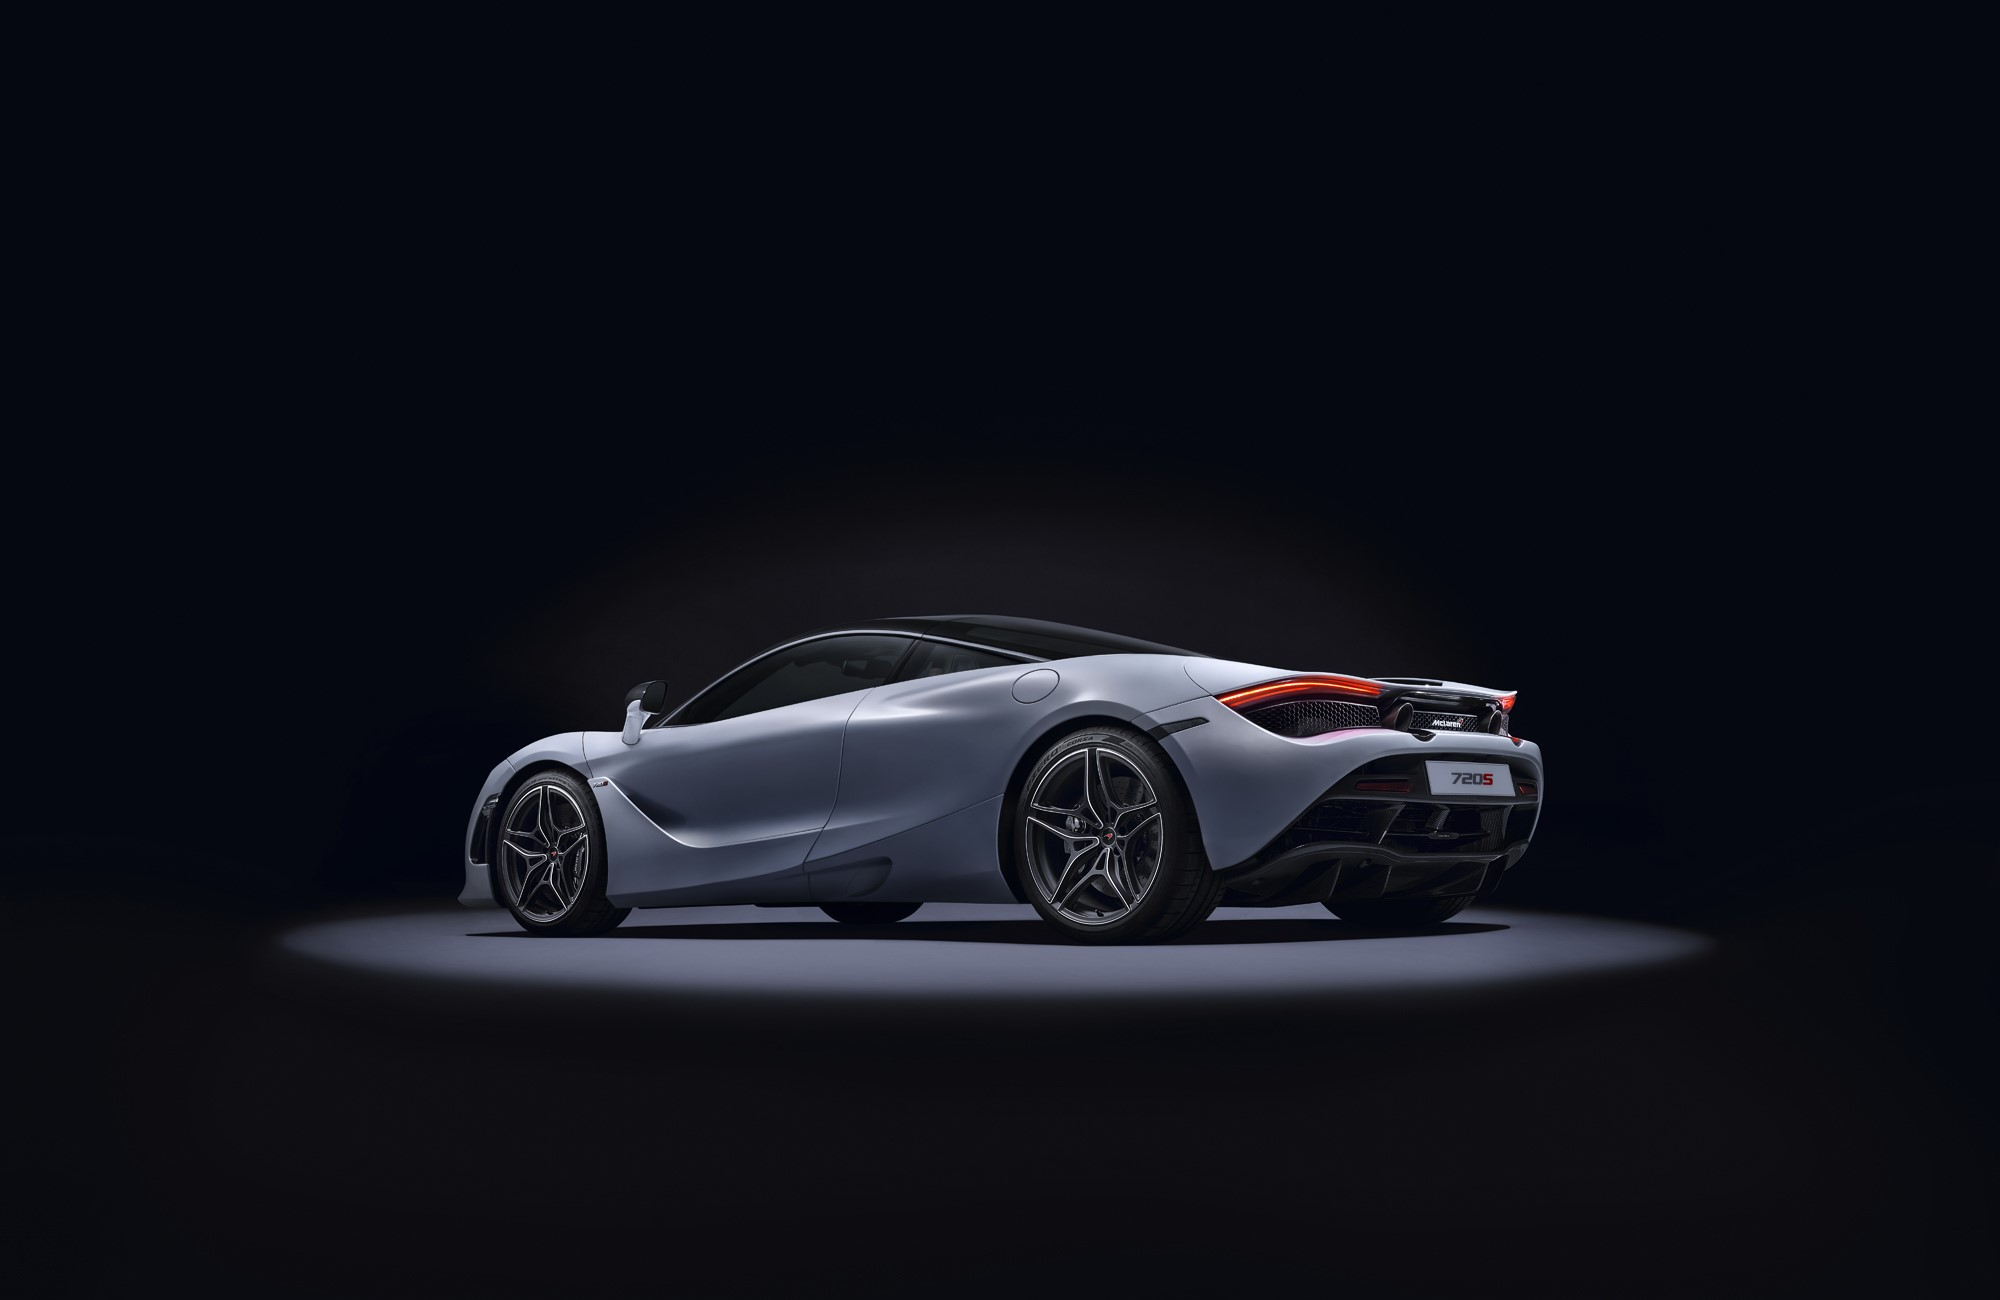 McLaren Pics